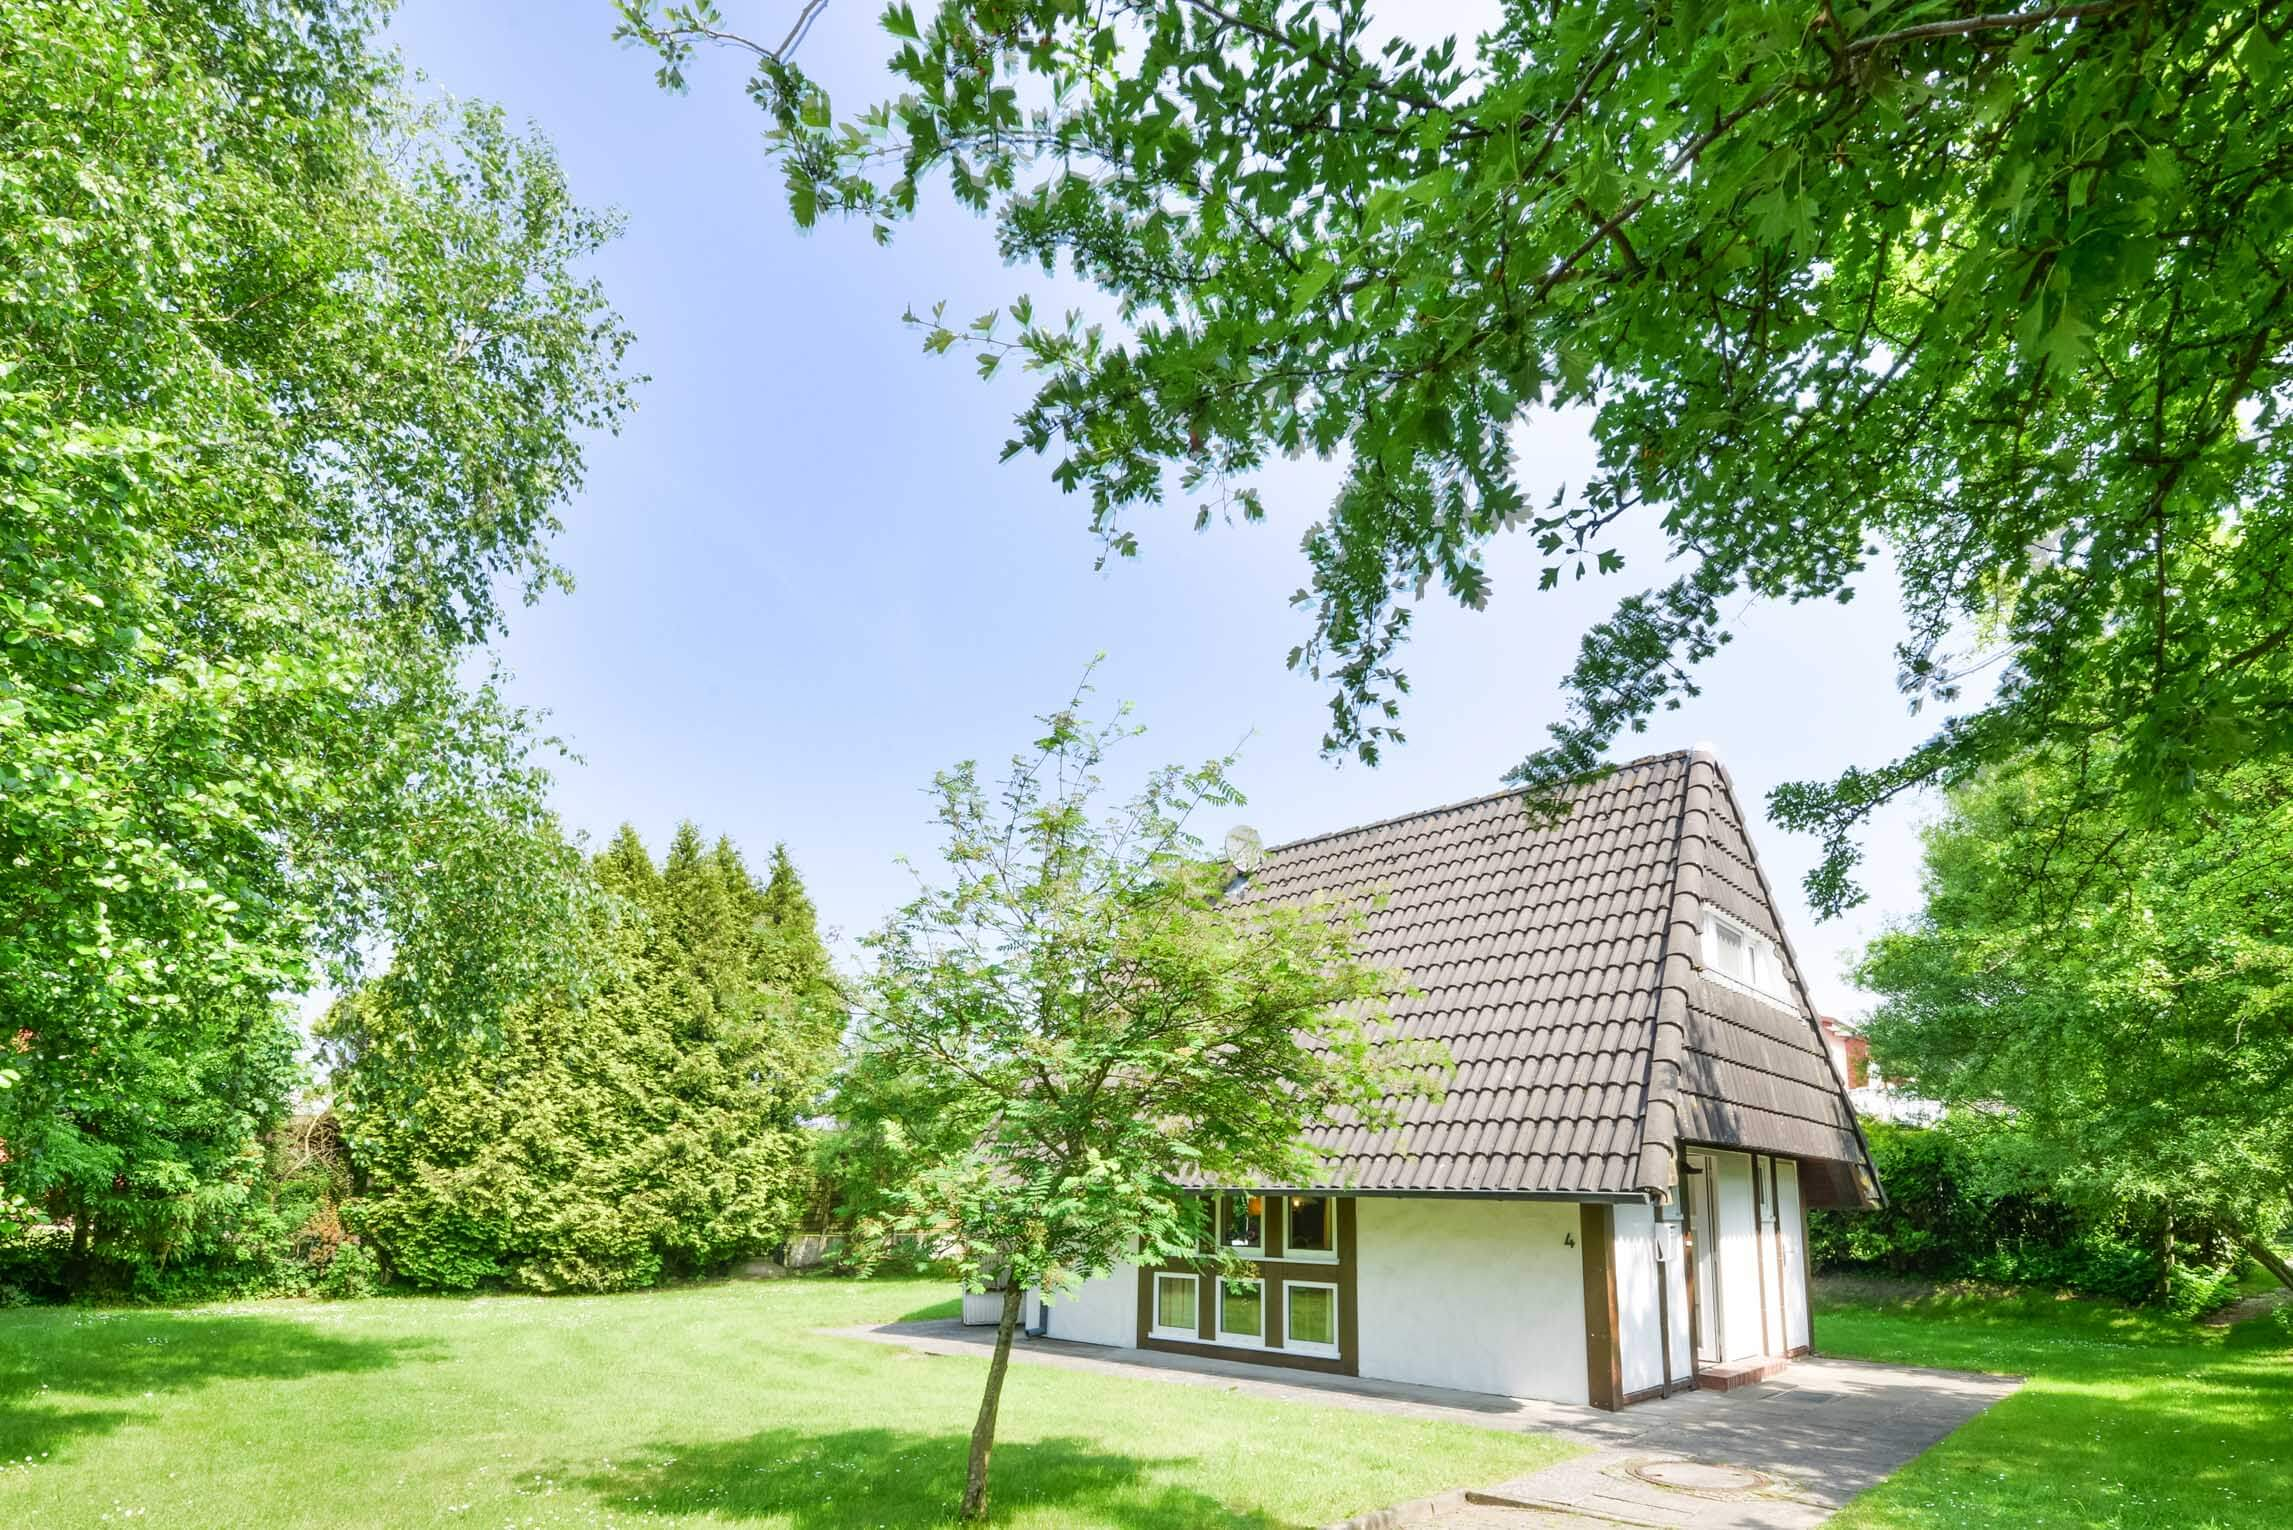 Ferienhaus Braband Cuxhaven